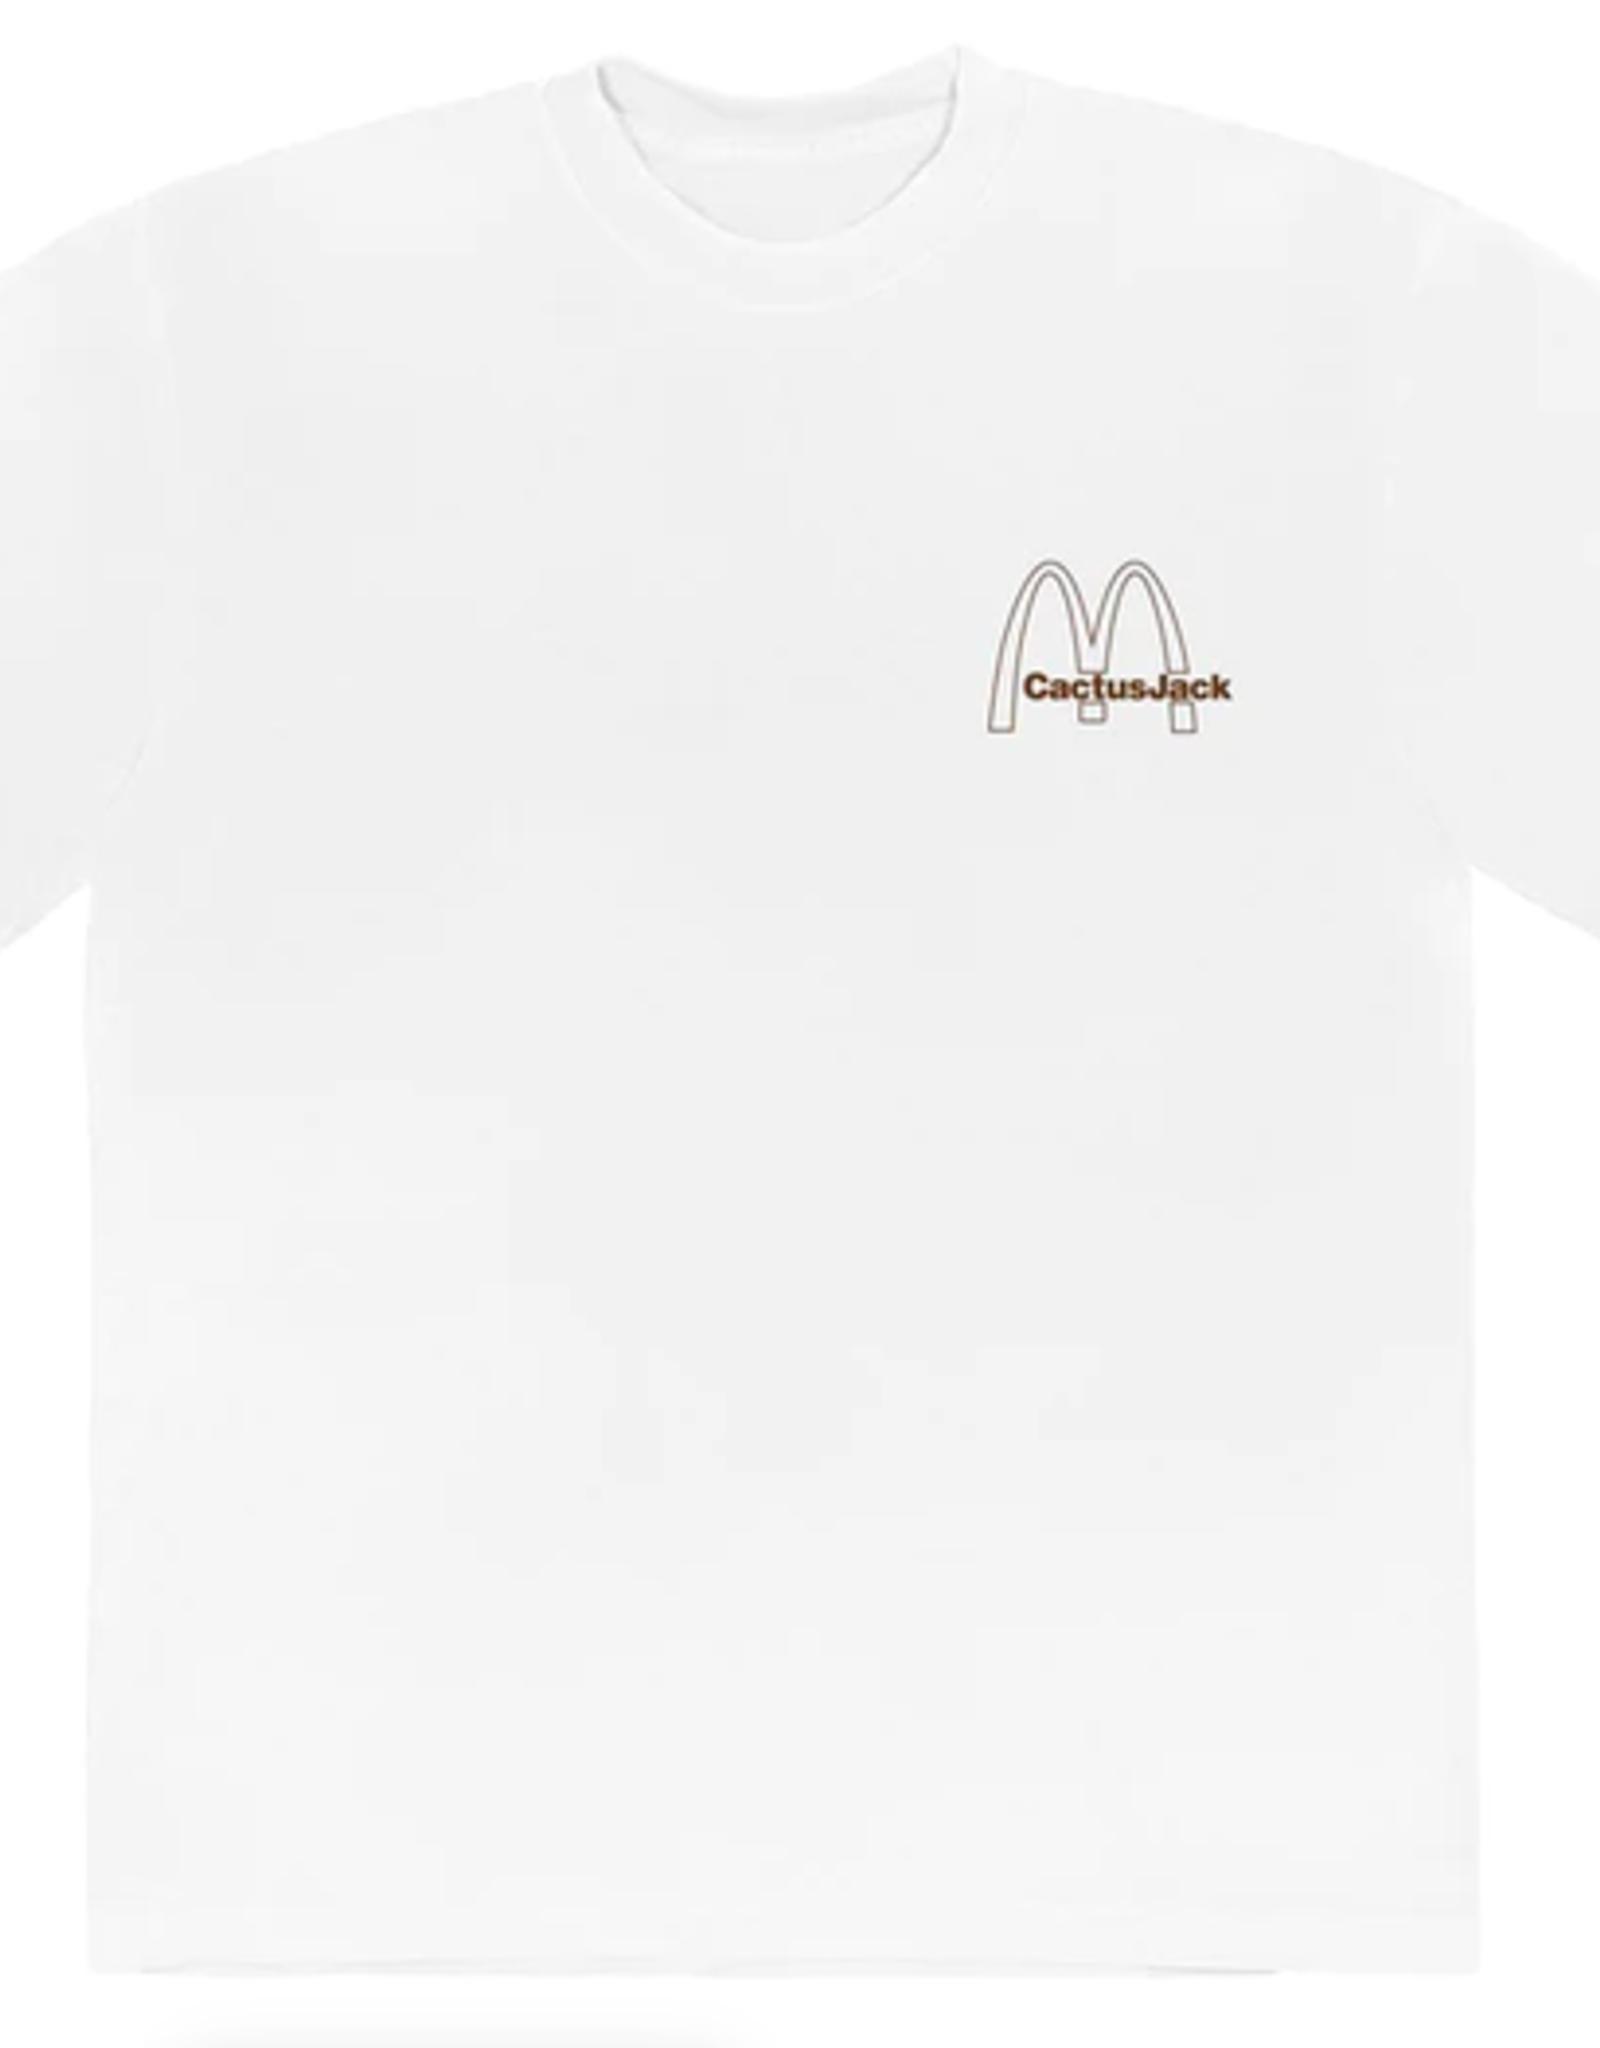 TRAVIS SCOTT Travis Scott x McDonald's Vintage Action T-Shirt White